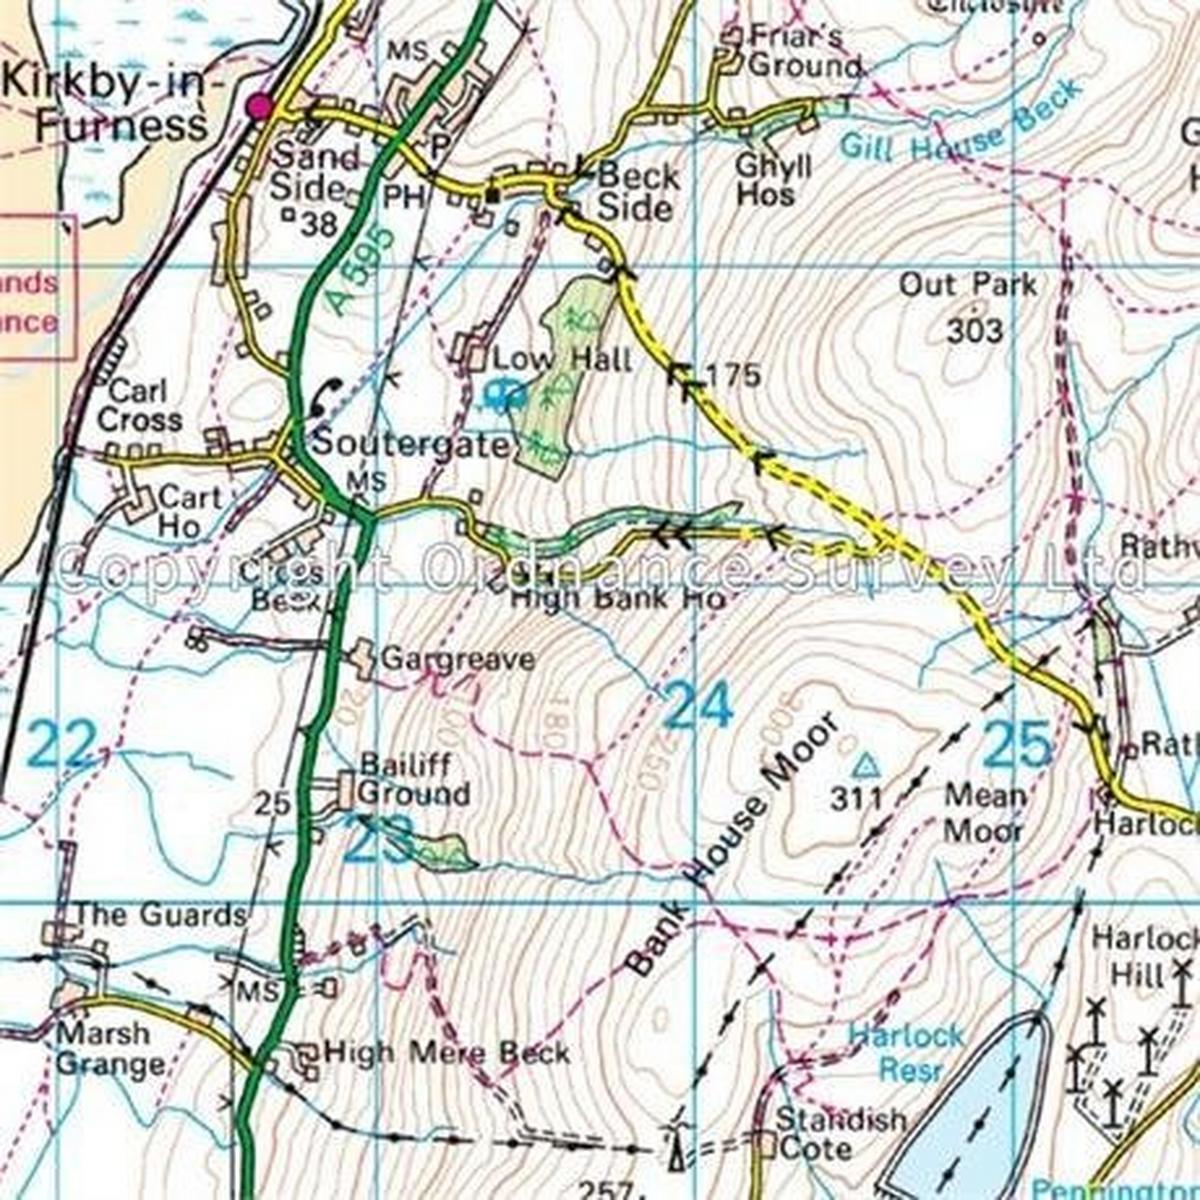 Ordnance Survey OS Landranger ACTIVE Map 96 Barrow-in-Furness & South Lakeland